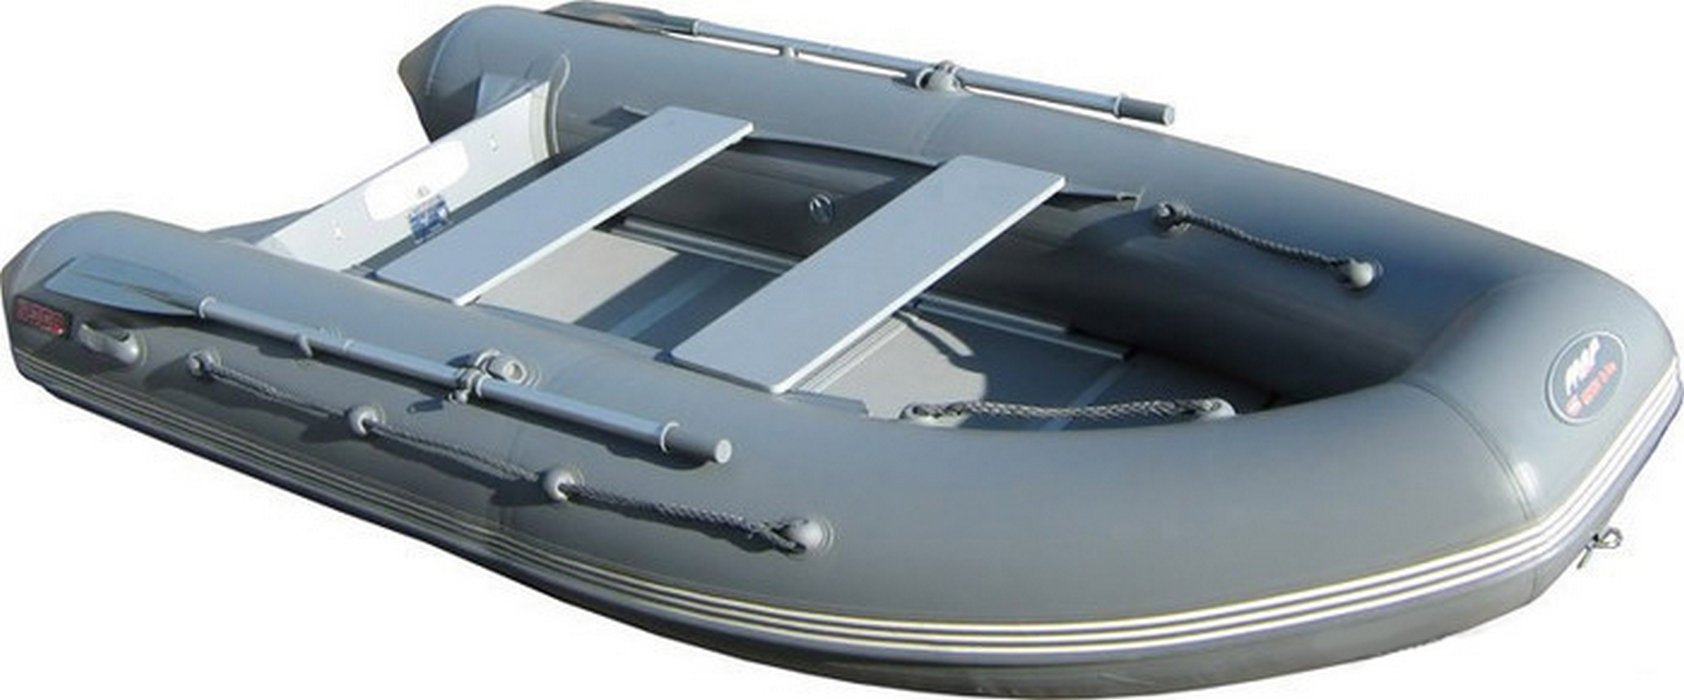 лодка кайман 280 характеристики